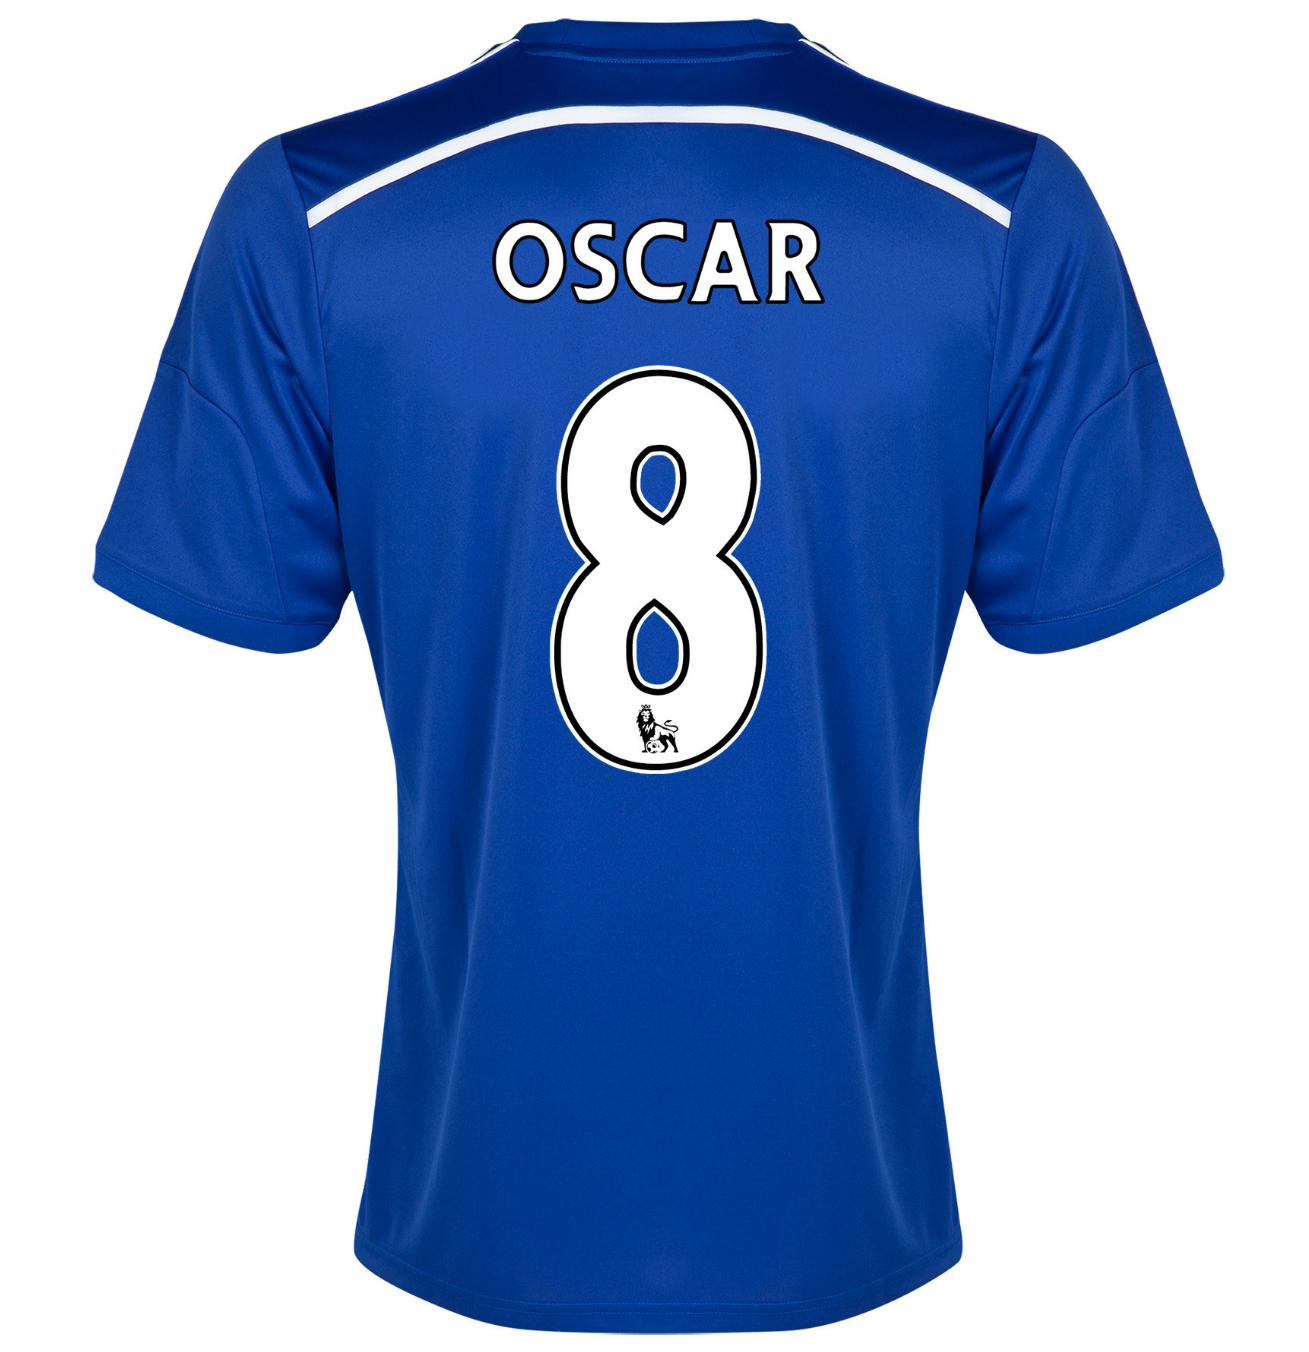 Chelsea 8 oscar home 2014 15 men soccer jersey football for Oscar home